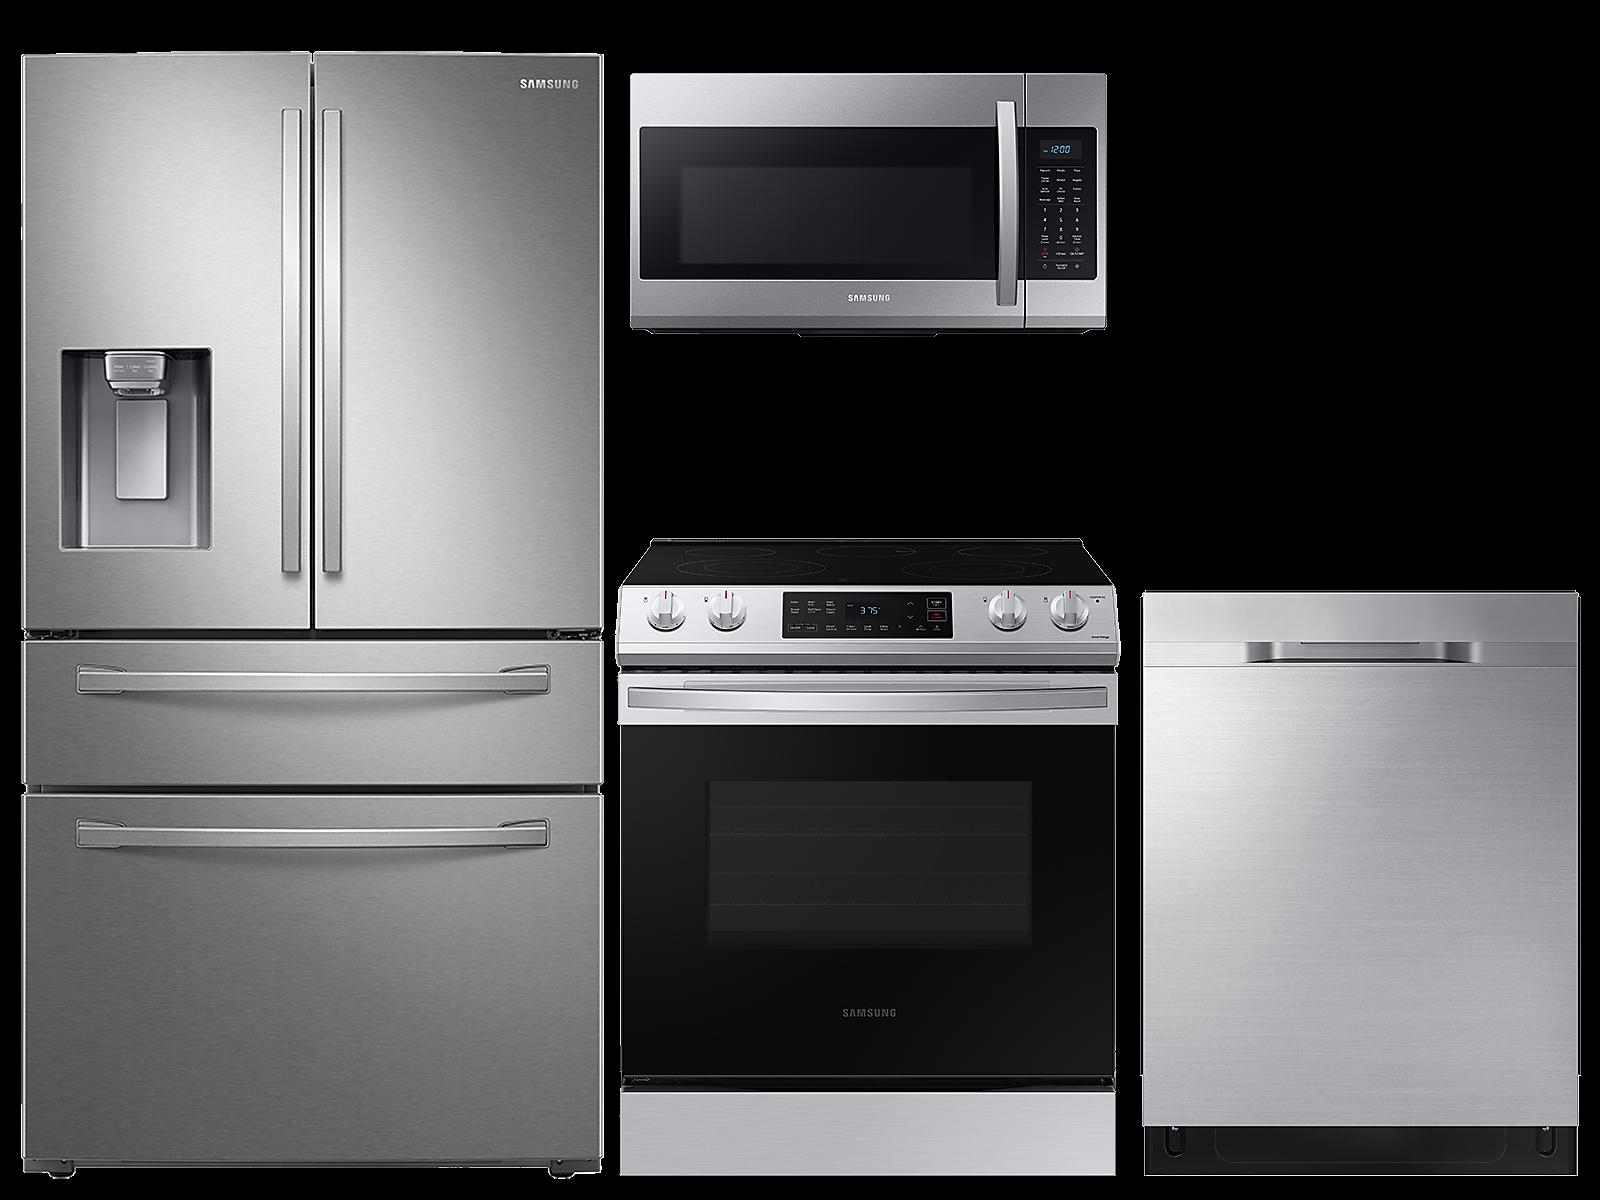 Samsung coupon: Samsung 28 cu. ft. 4-door refrigerator, 6.3 cu. ft. electric range, microwave and 48 dBA dishwasher package(BNDL-1613506659614)